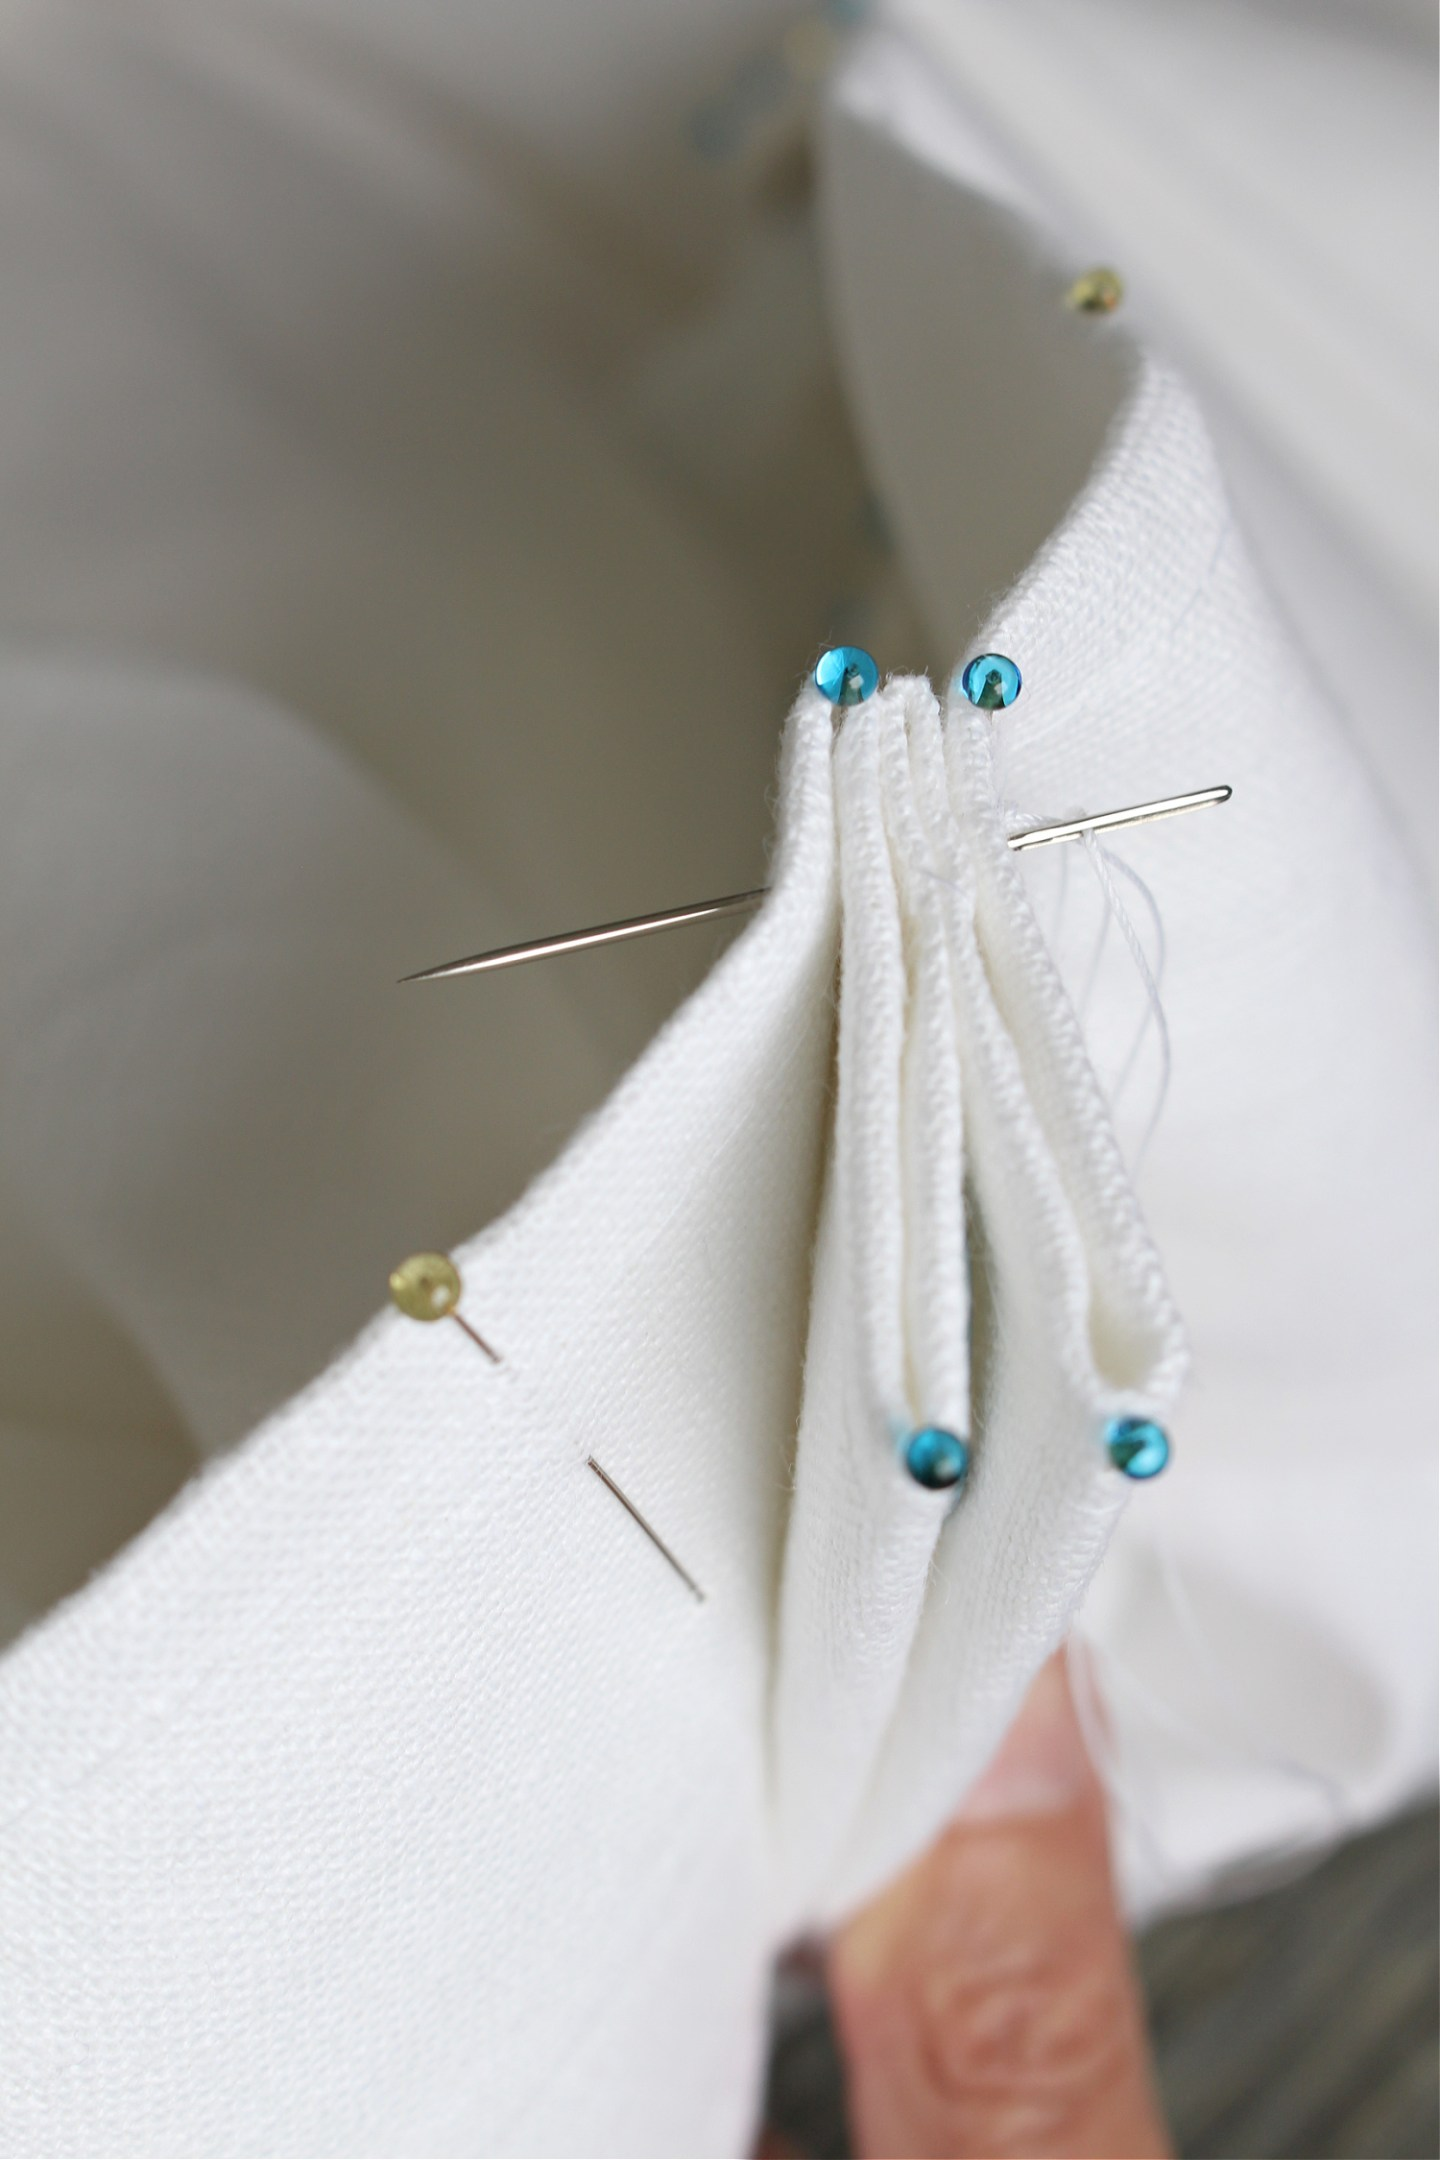 How to Hand Stitch Sew Euro Pleats